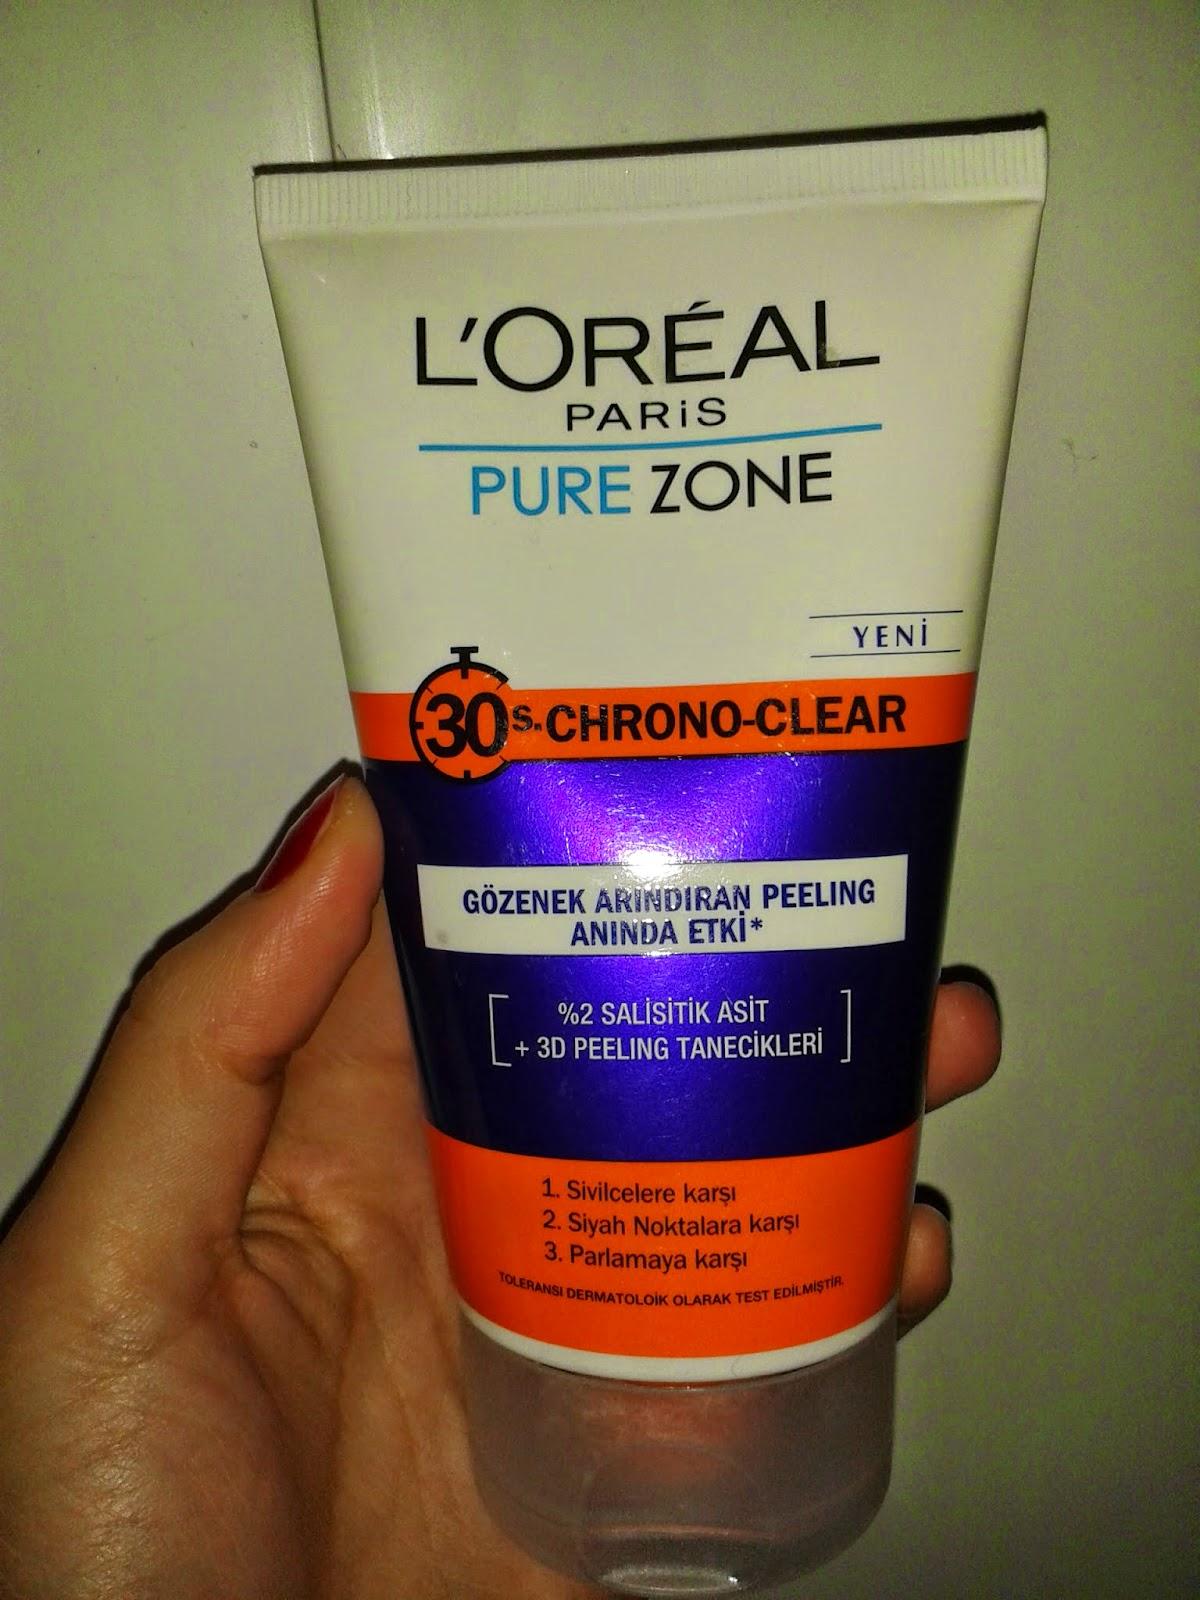 loreal pure zone chrone clear peeling